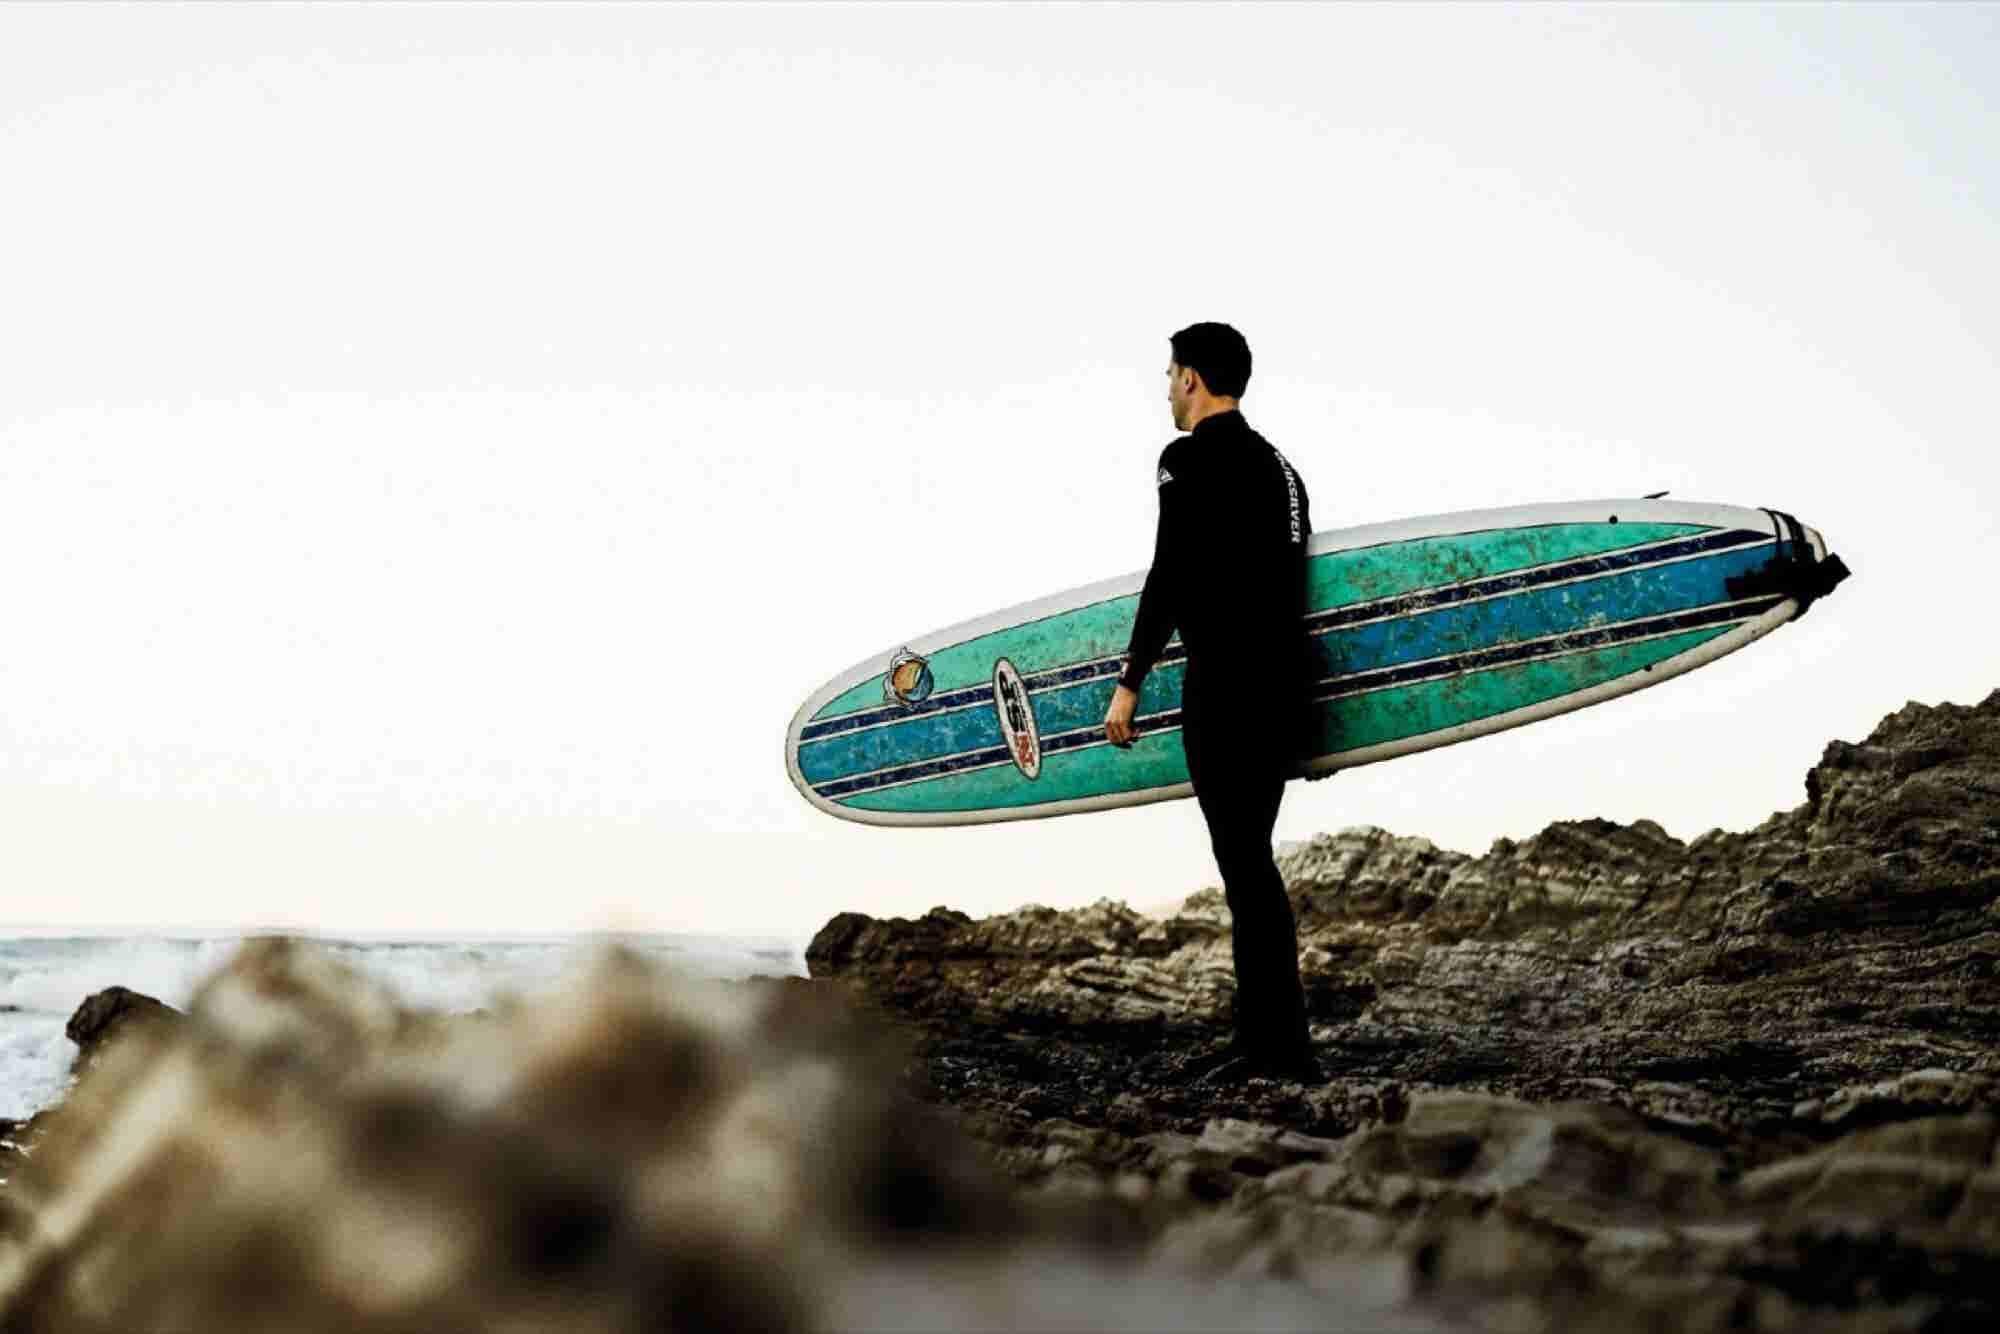 4 Brilliant, Risky (Let's Just Call It Crazy) Ways Real Entrepreneurs Made It Big